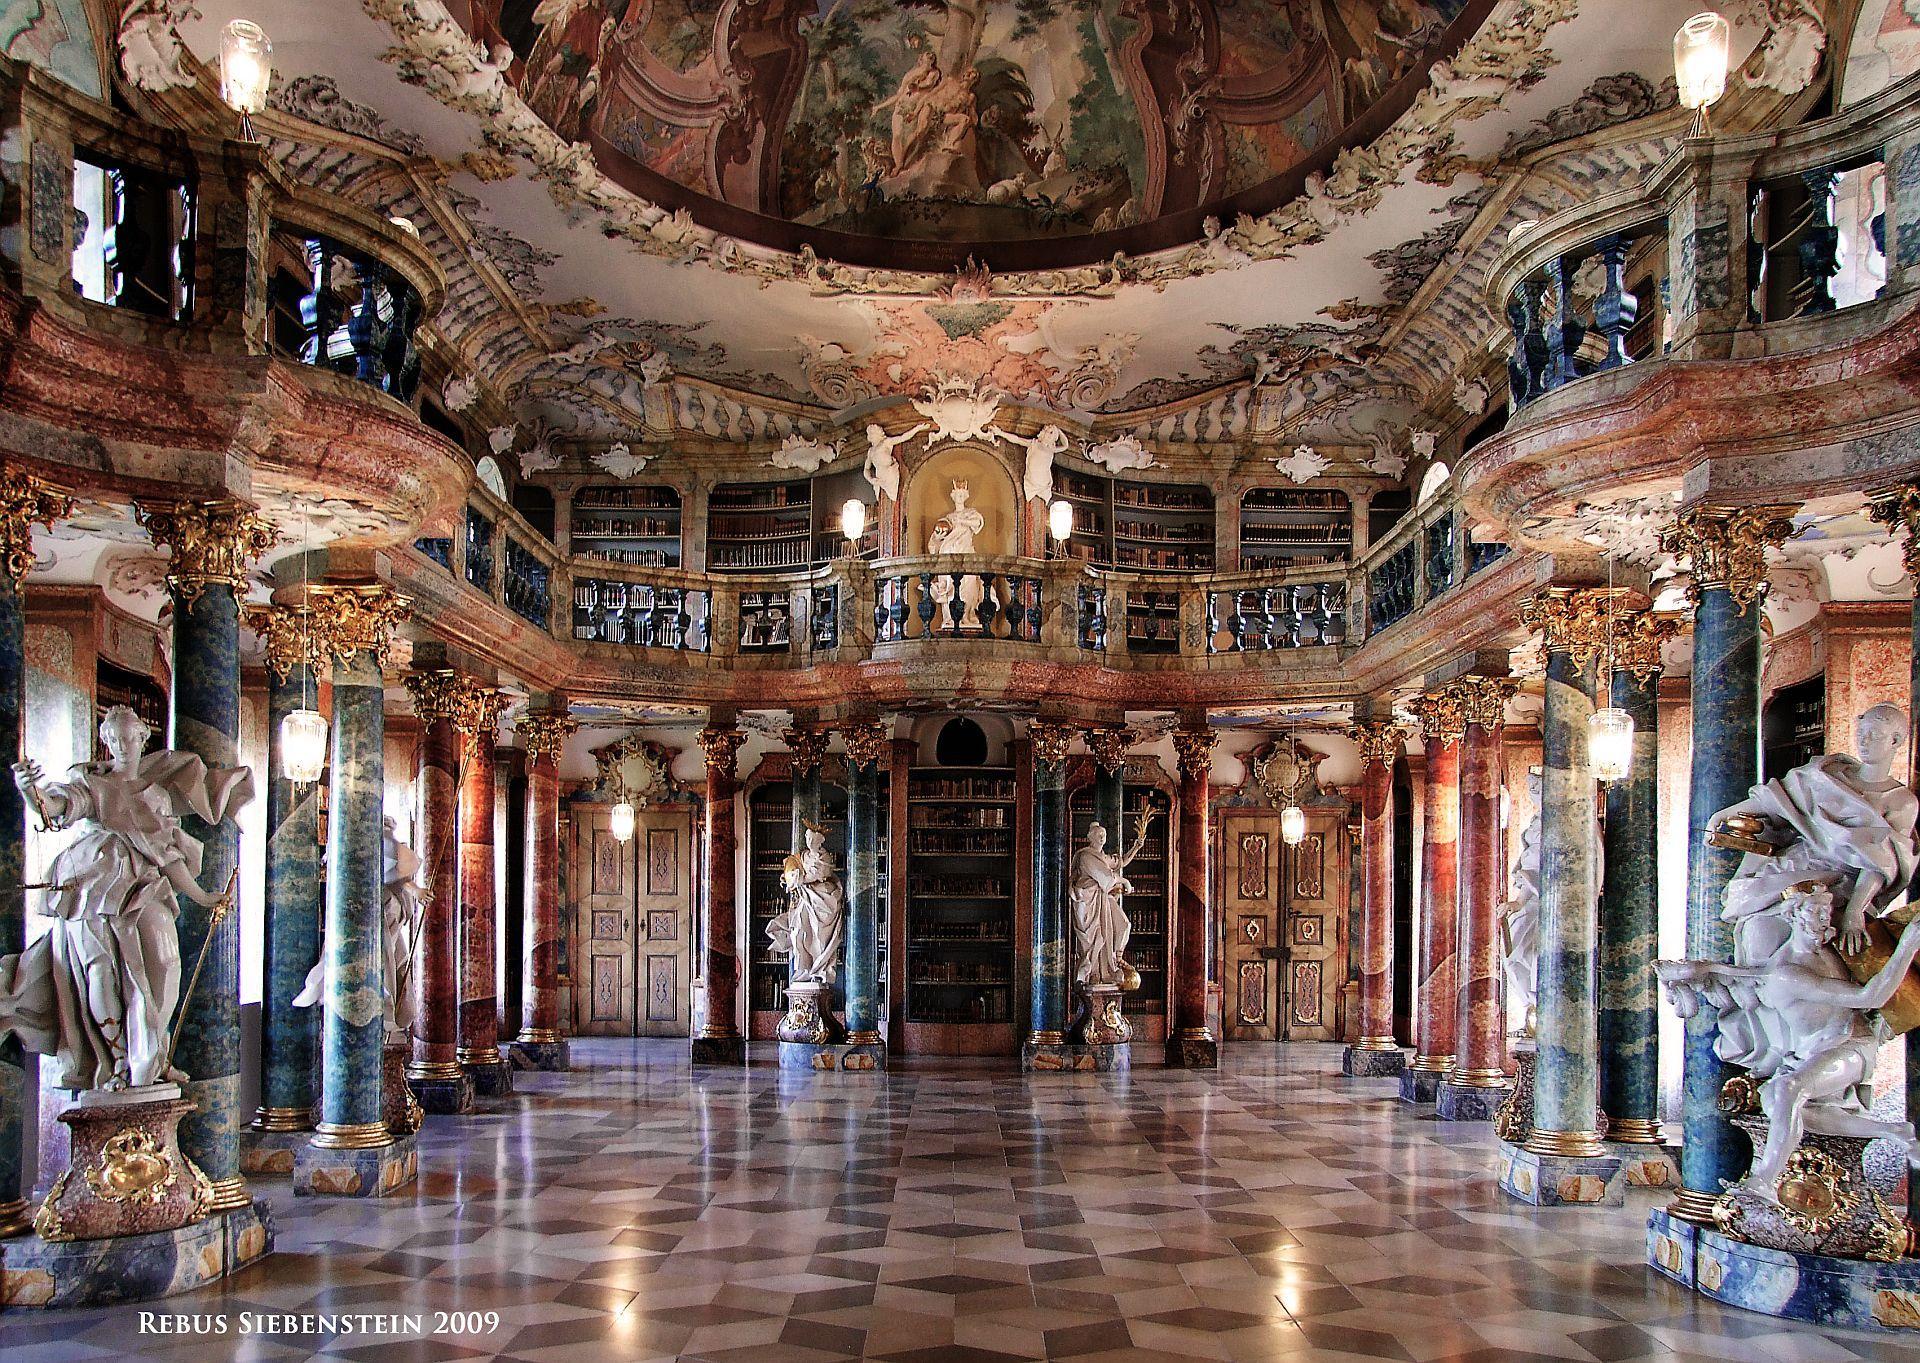 De Wiblingen Kloster Bibliothekssaal Kloster Bibliothek Barock Architektur